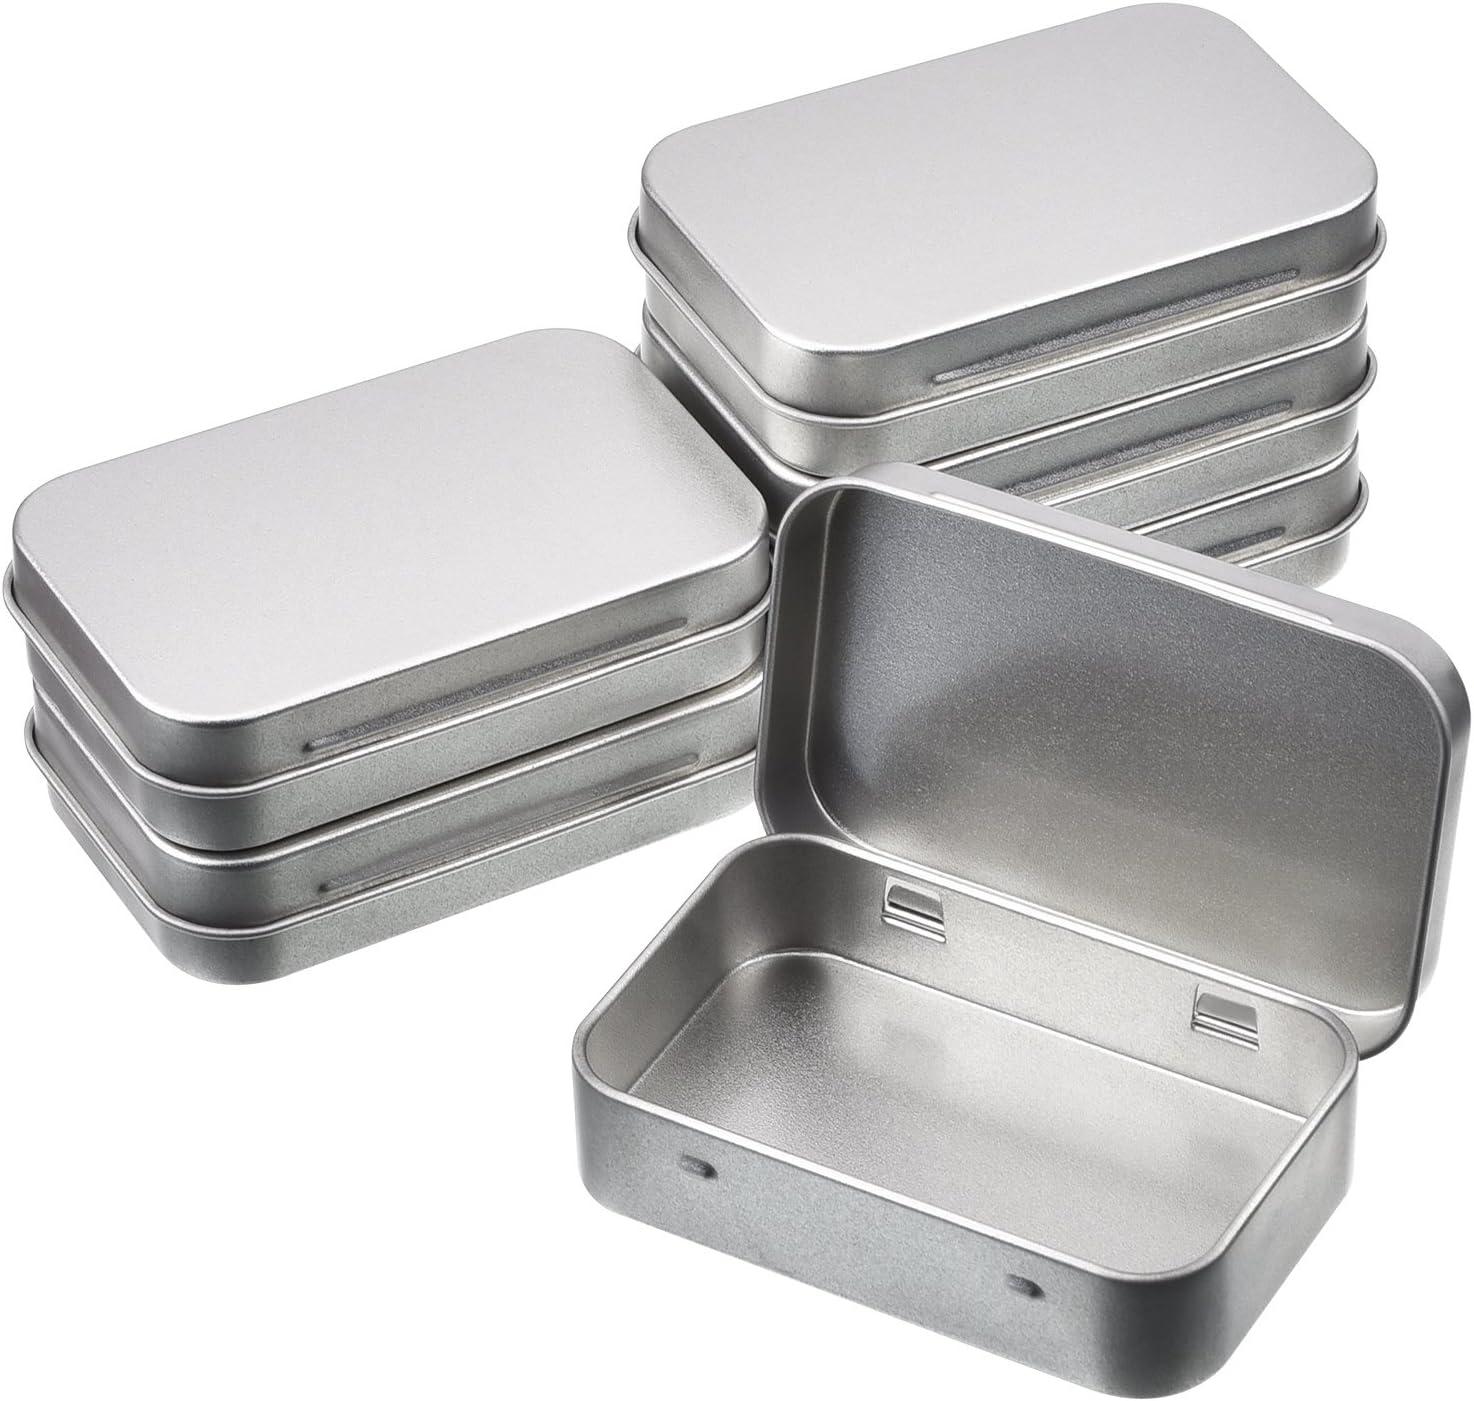 Shappy Latas de Bisagra Rectangular Contenedor de Almacenaje Caja Portátil de Metal Plateado Mini Estuche, Organizador de Hogar, 3,75 x 2,45 x 0,8 Pulgadas, 6 Piezas